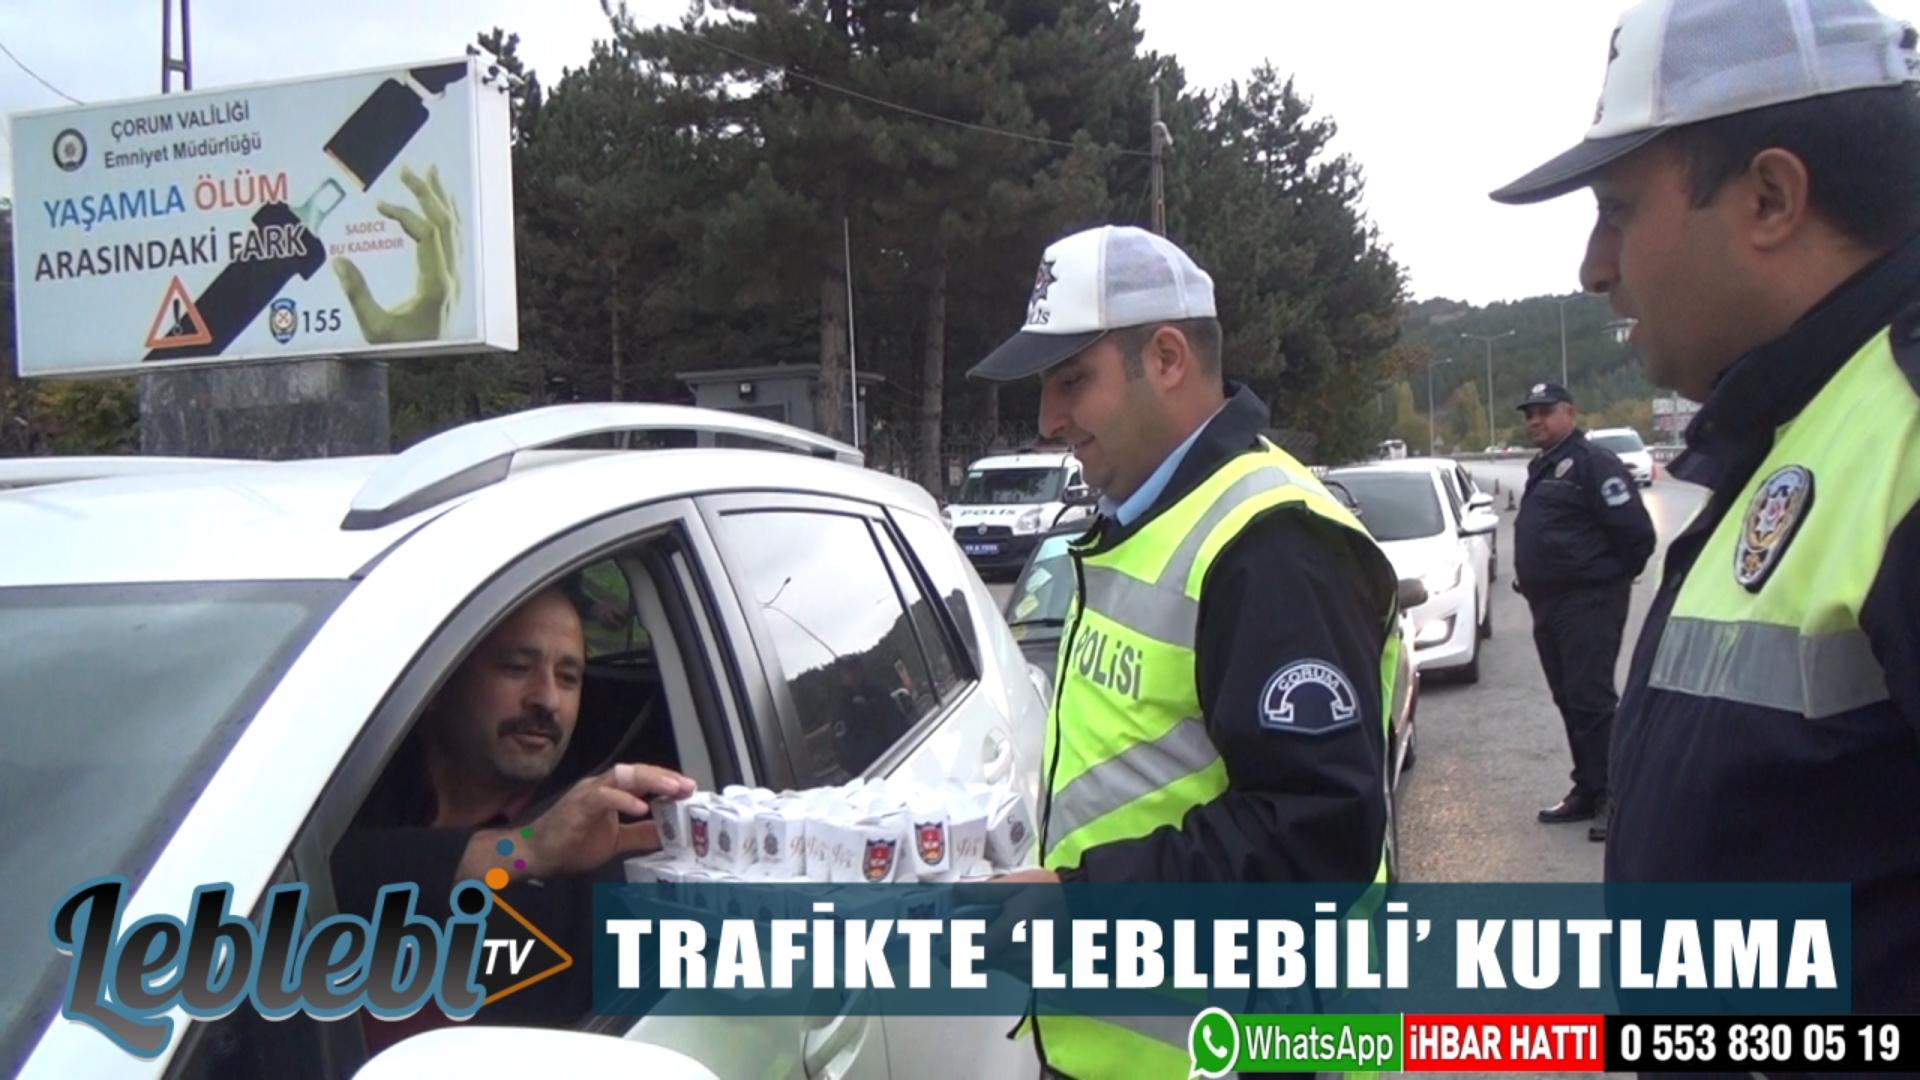 TRAFİKTE 'LEBLEBİLİ' KUTLAMA